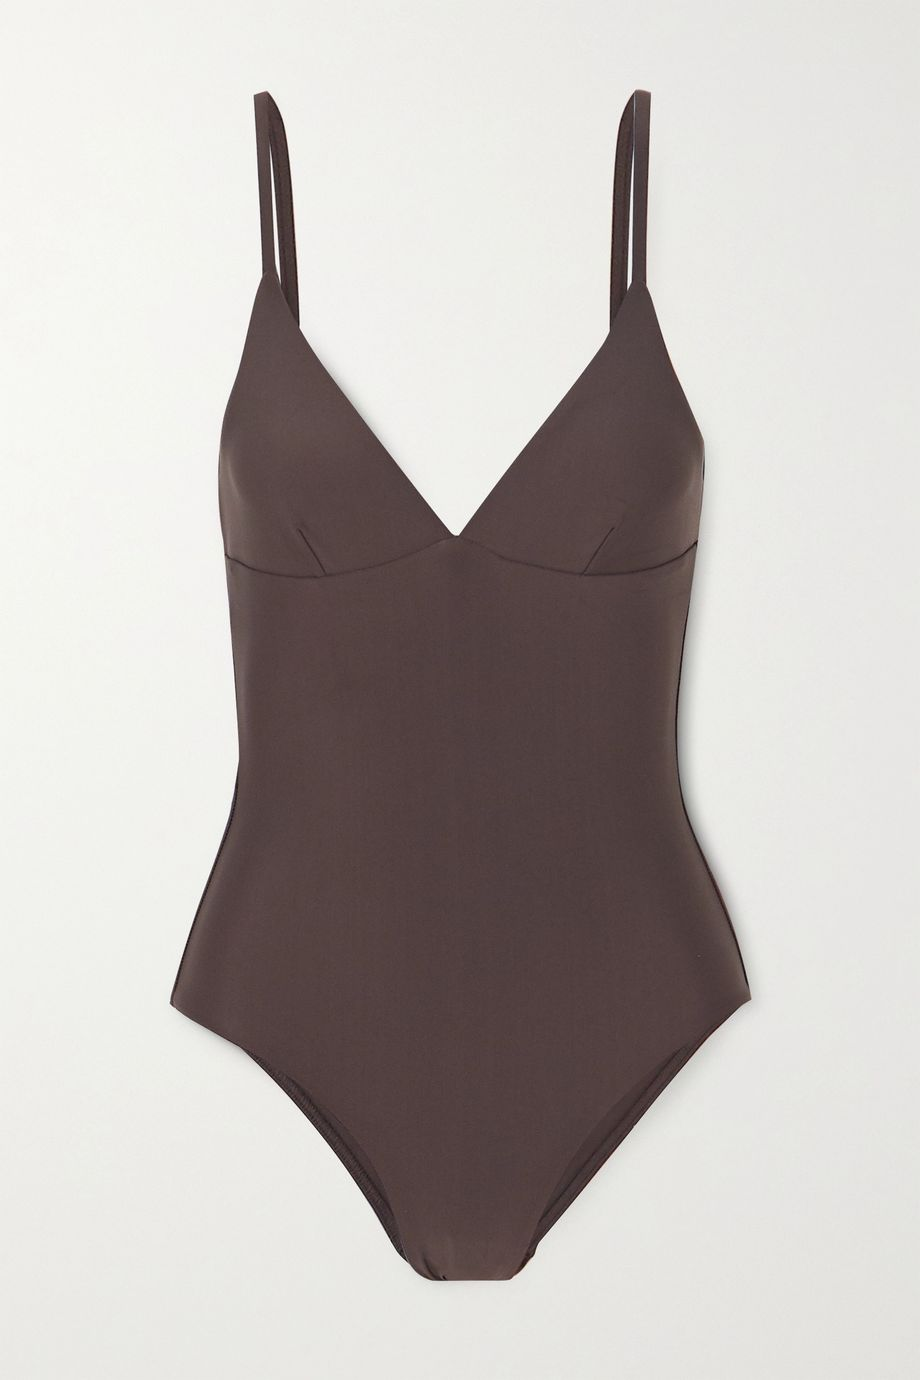 Matteau The Plunge swimsuit